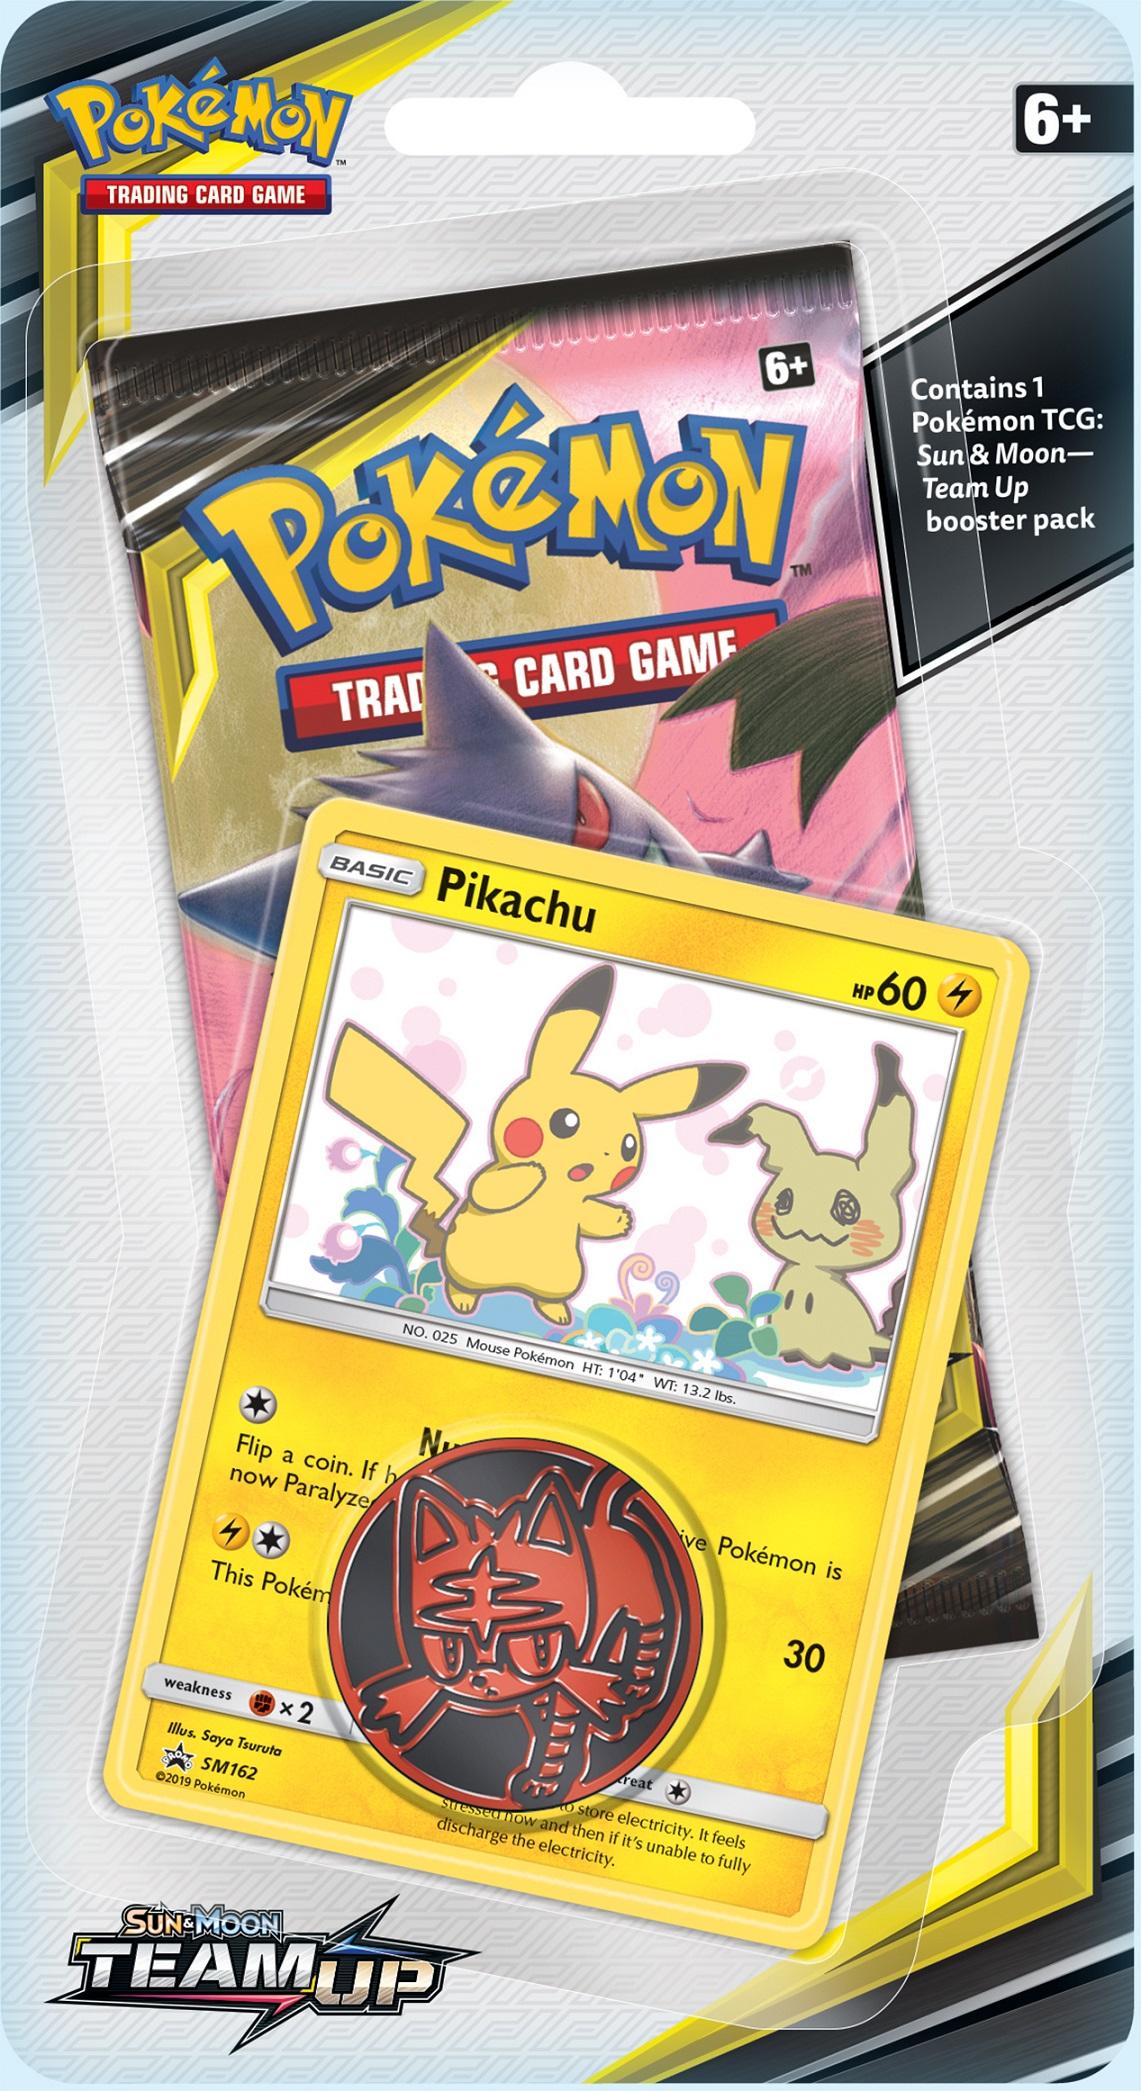 Pokemon SM9 Team Up Checklane Blister Pack - Pikachu